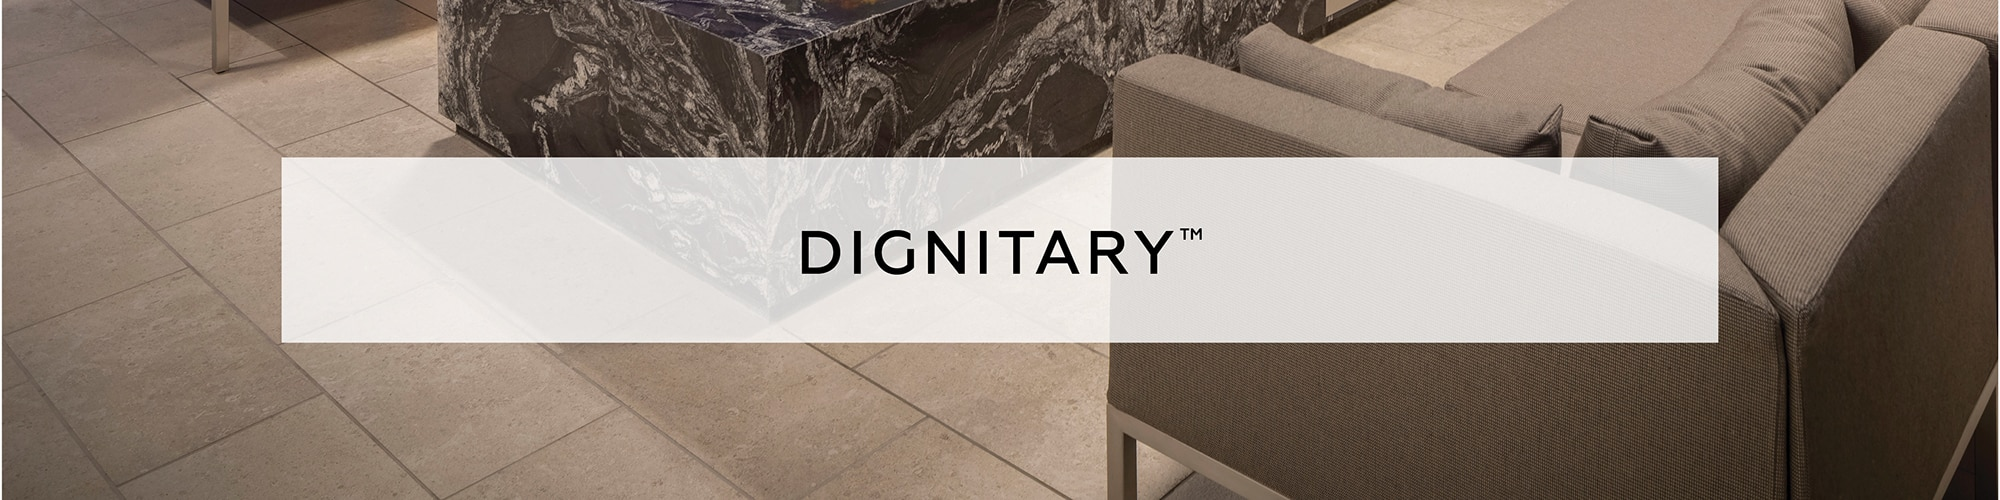 DAL_Aug2020_Dignitary_41_banner